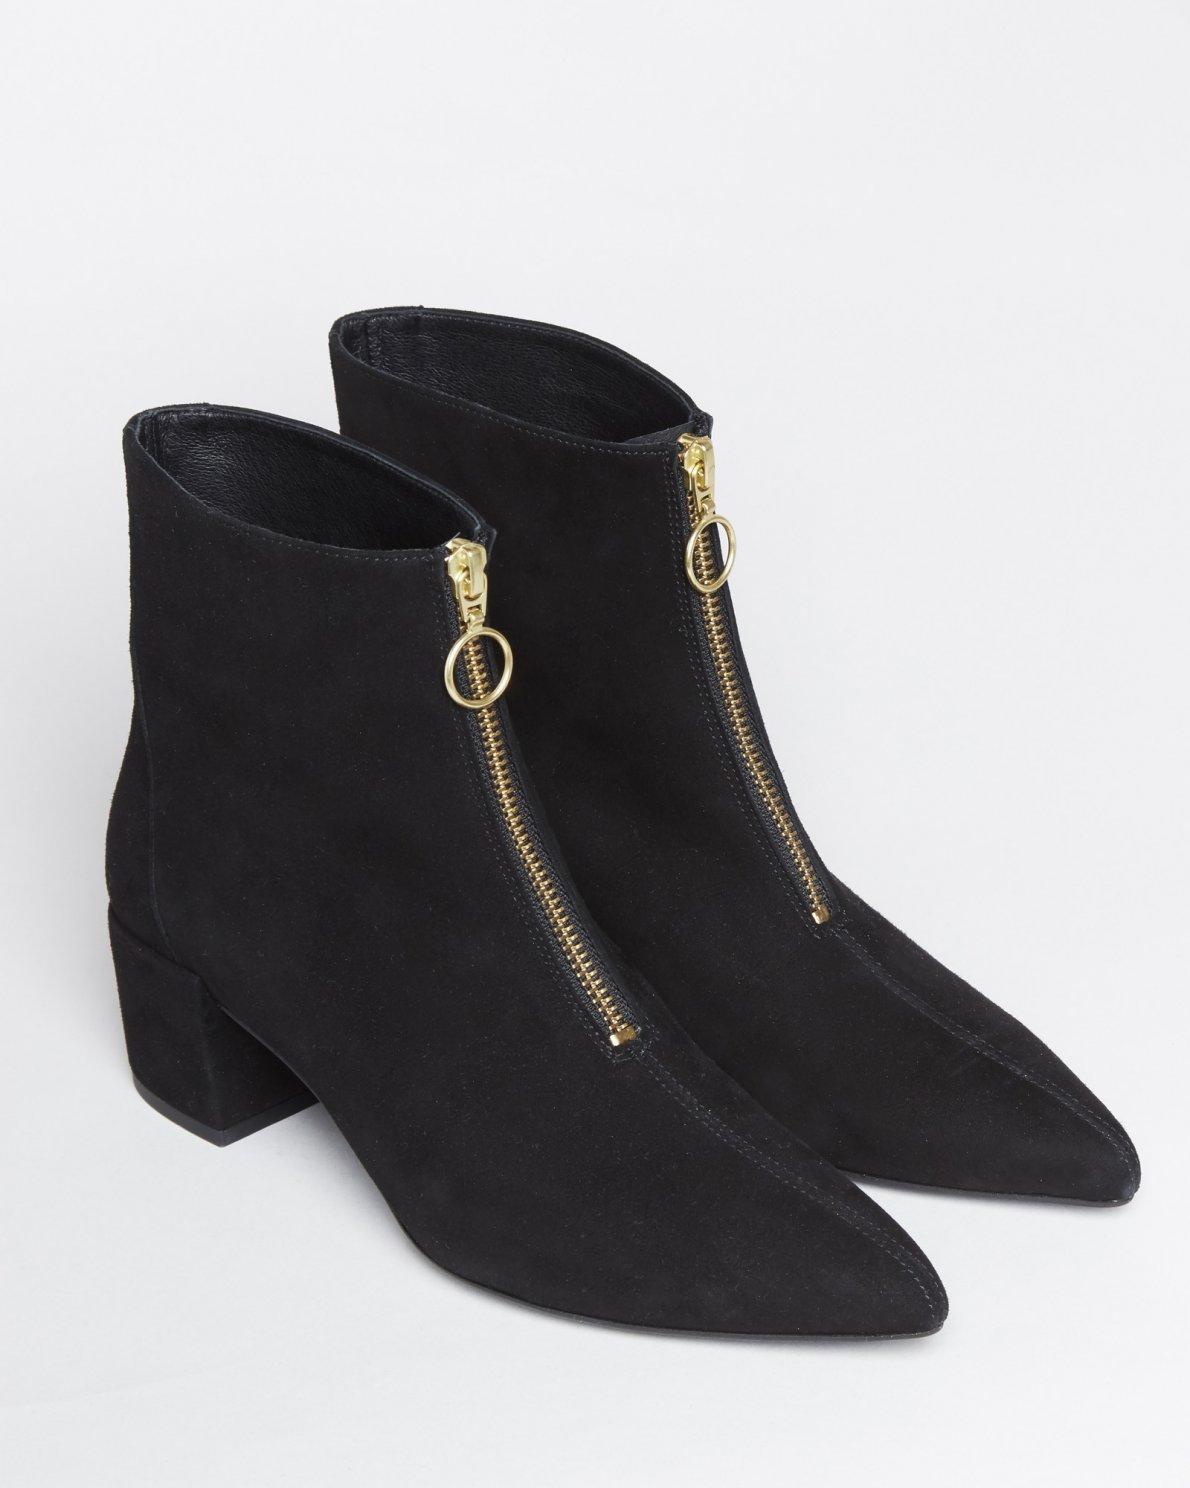 moss copenhagen shoes